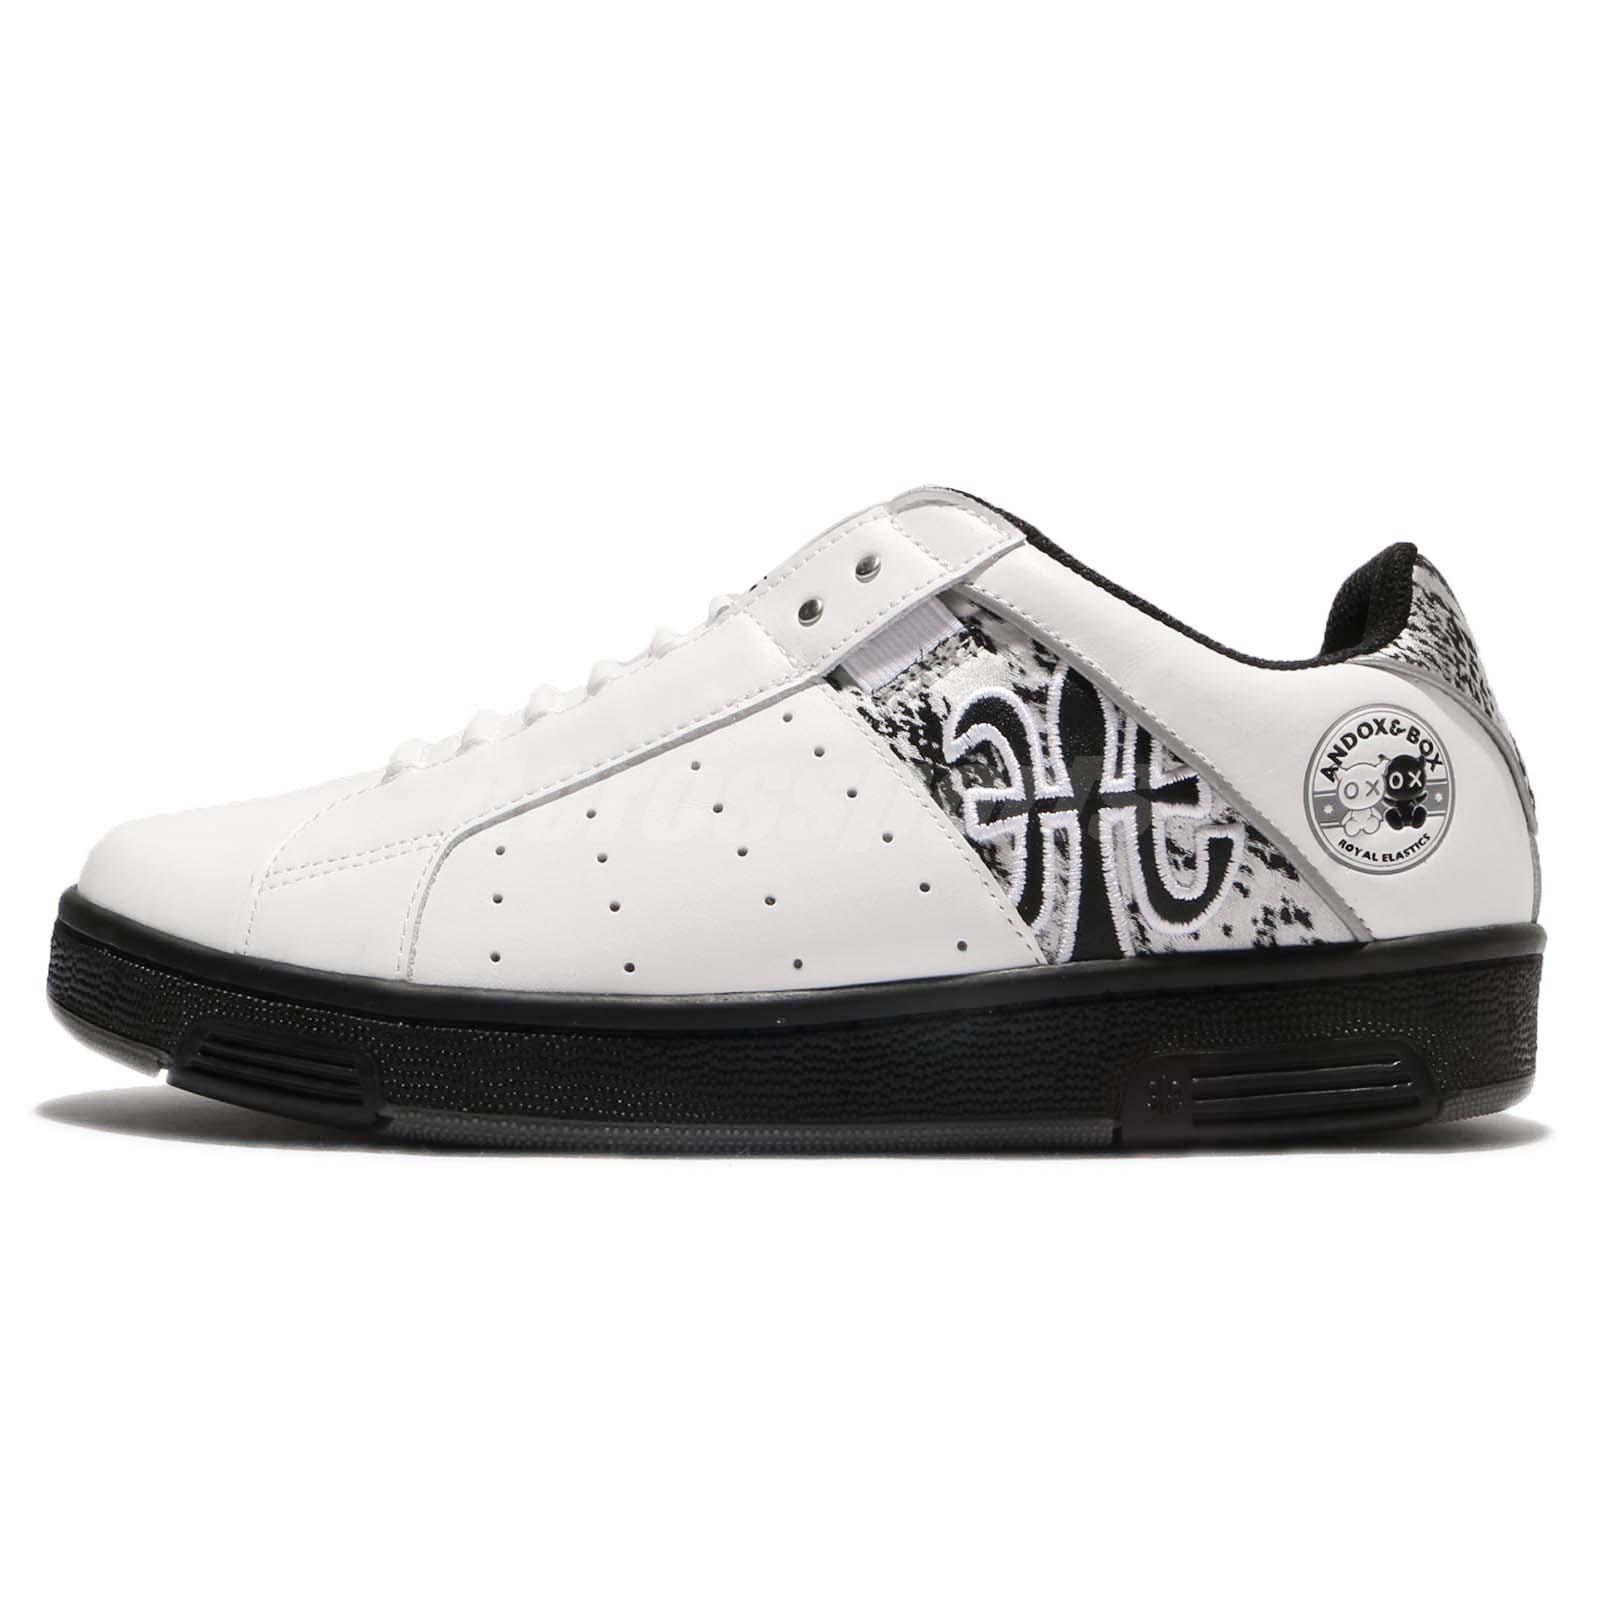 Royal Elastics Icon x Andox Box 1707 Black White Leather Men Shoes ...